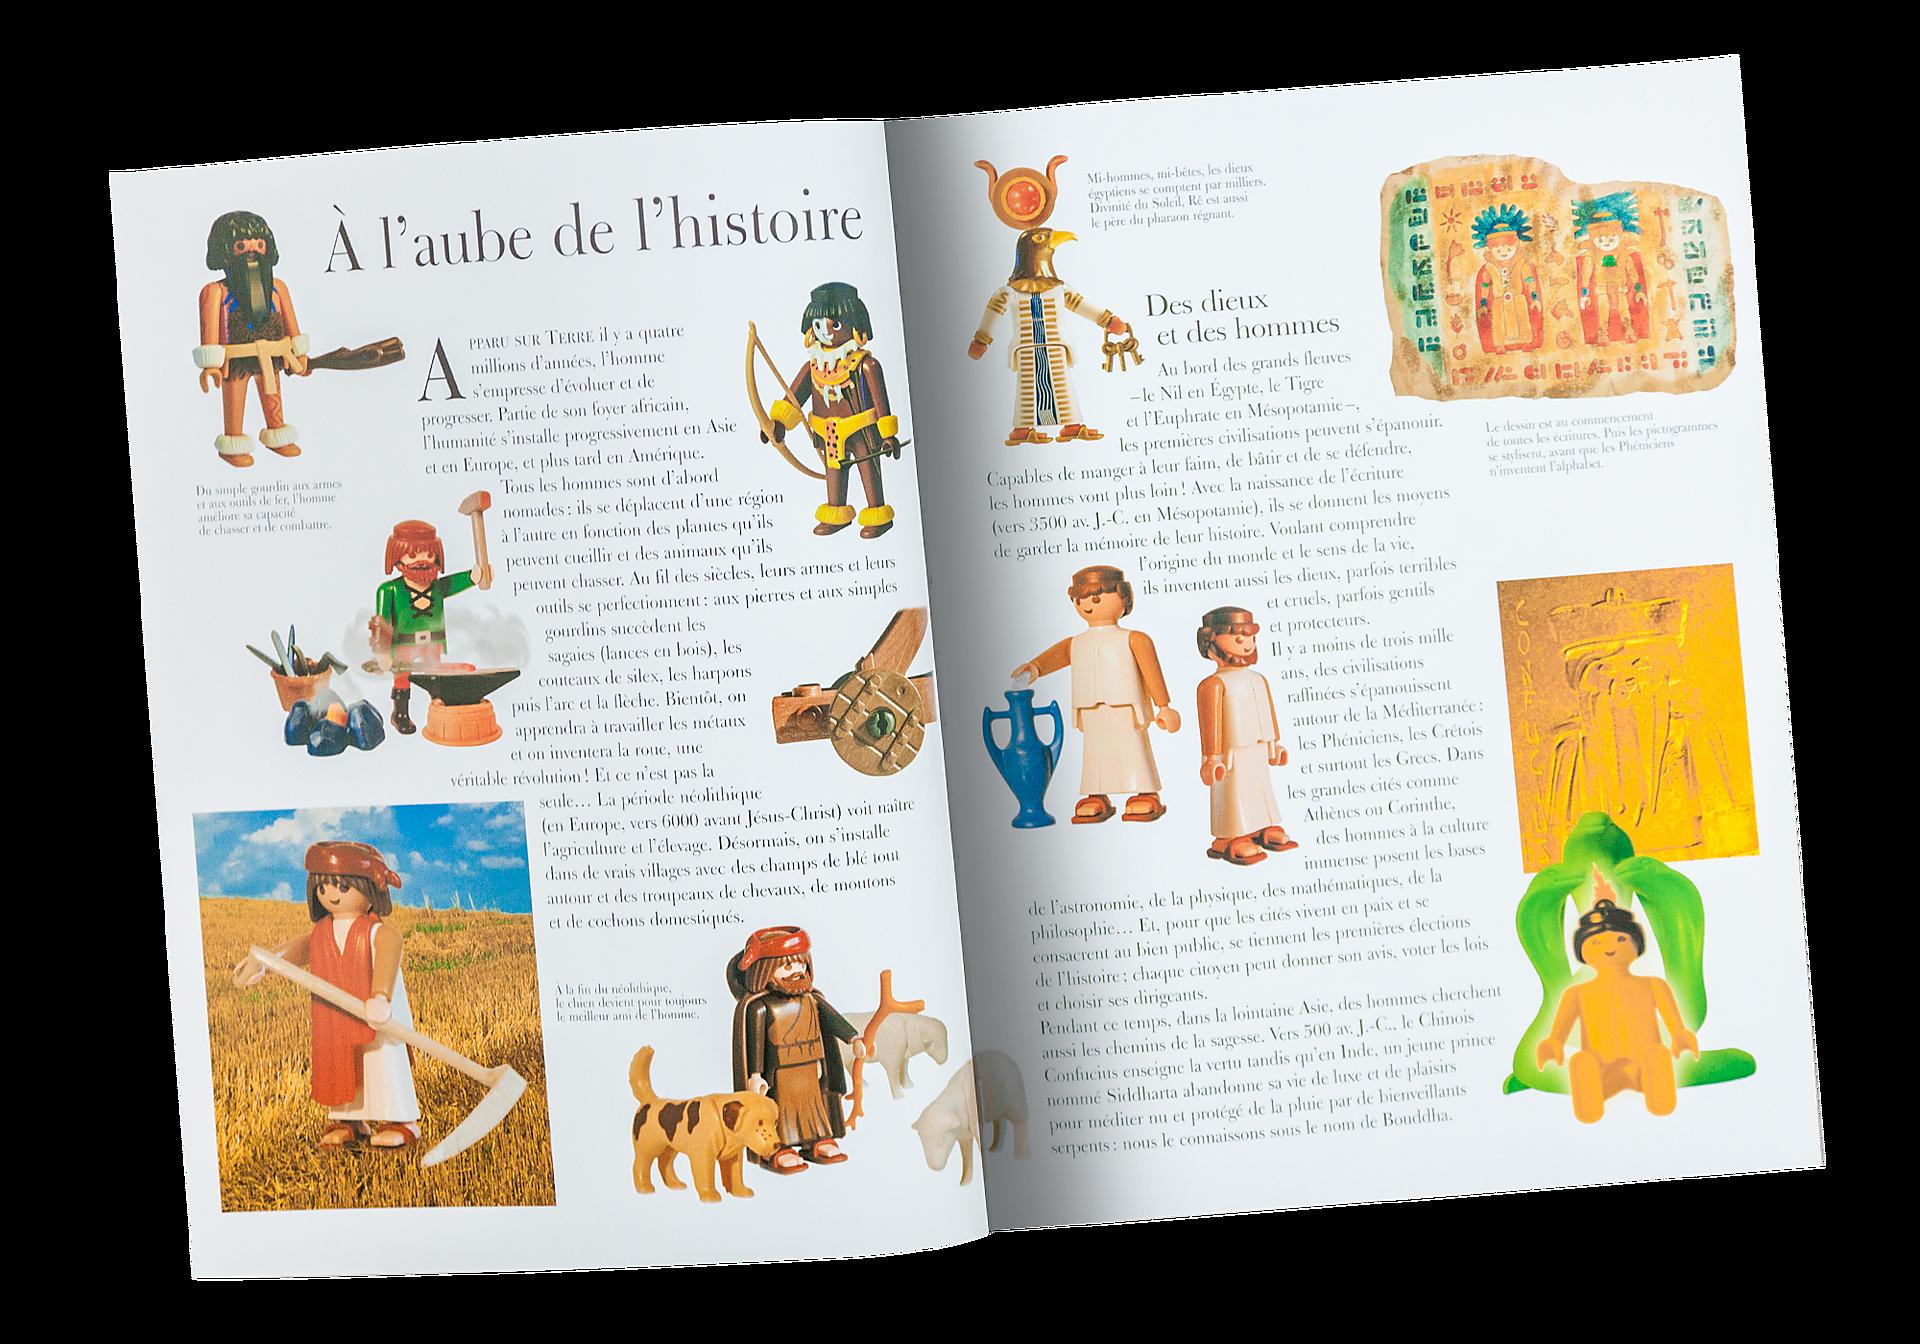 http://media.playmobil.com/i/playmobil/80042_product_extra2/La grande Aventure de I`Histoire avec PLAYMOBIL français